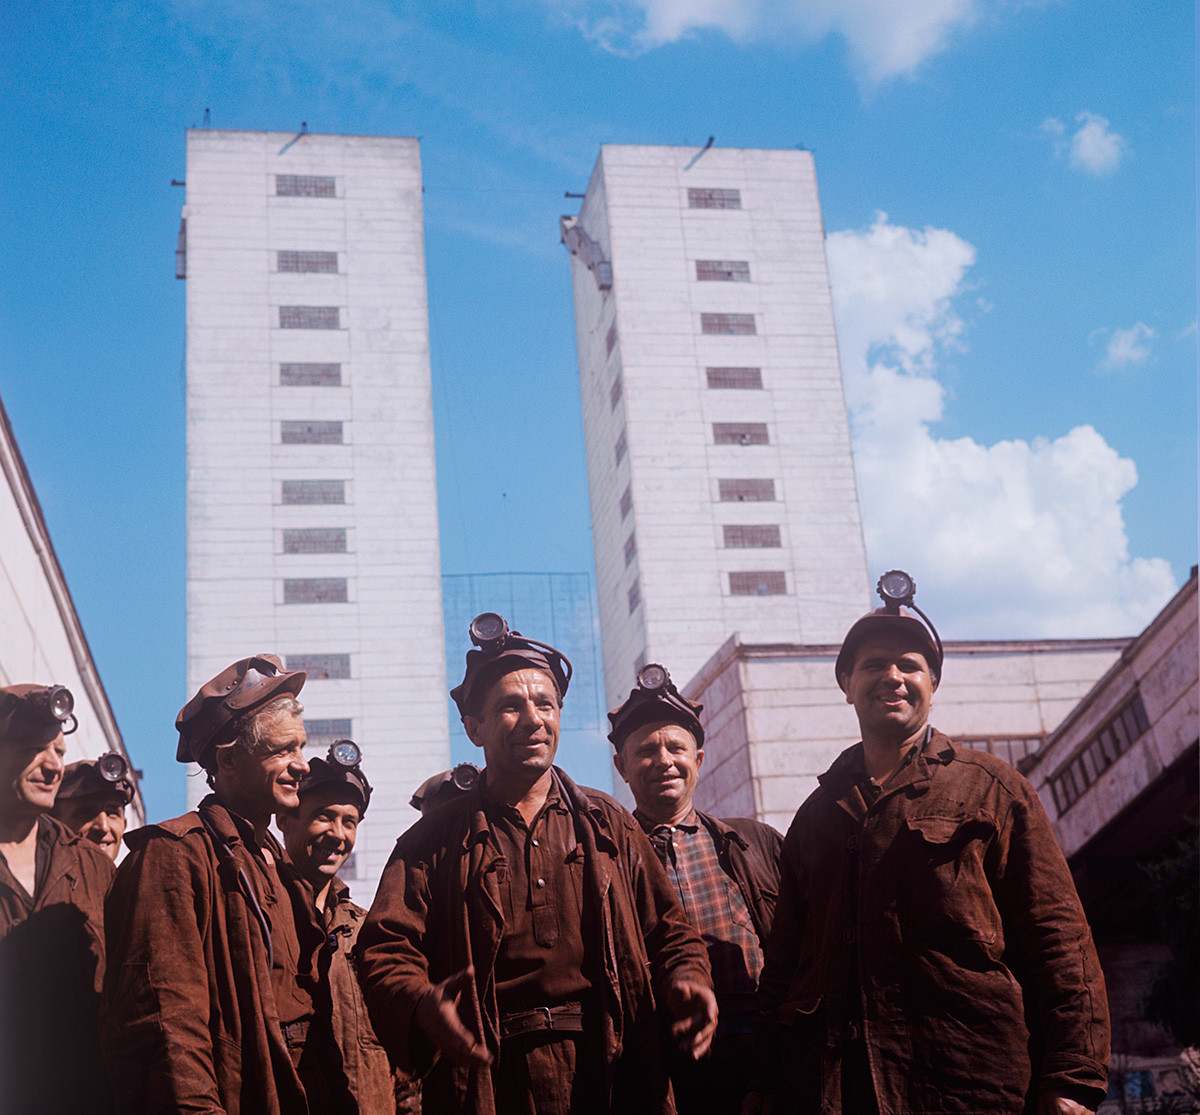 Bergleute in der Gwardeiskaja-Mine, Krywyj Rih, 1970